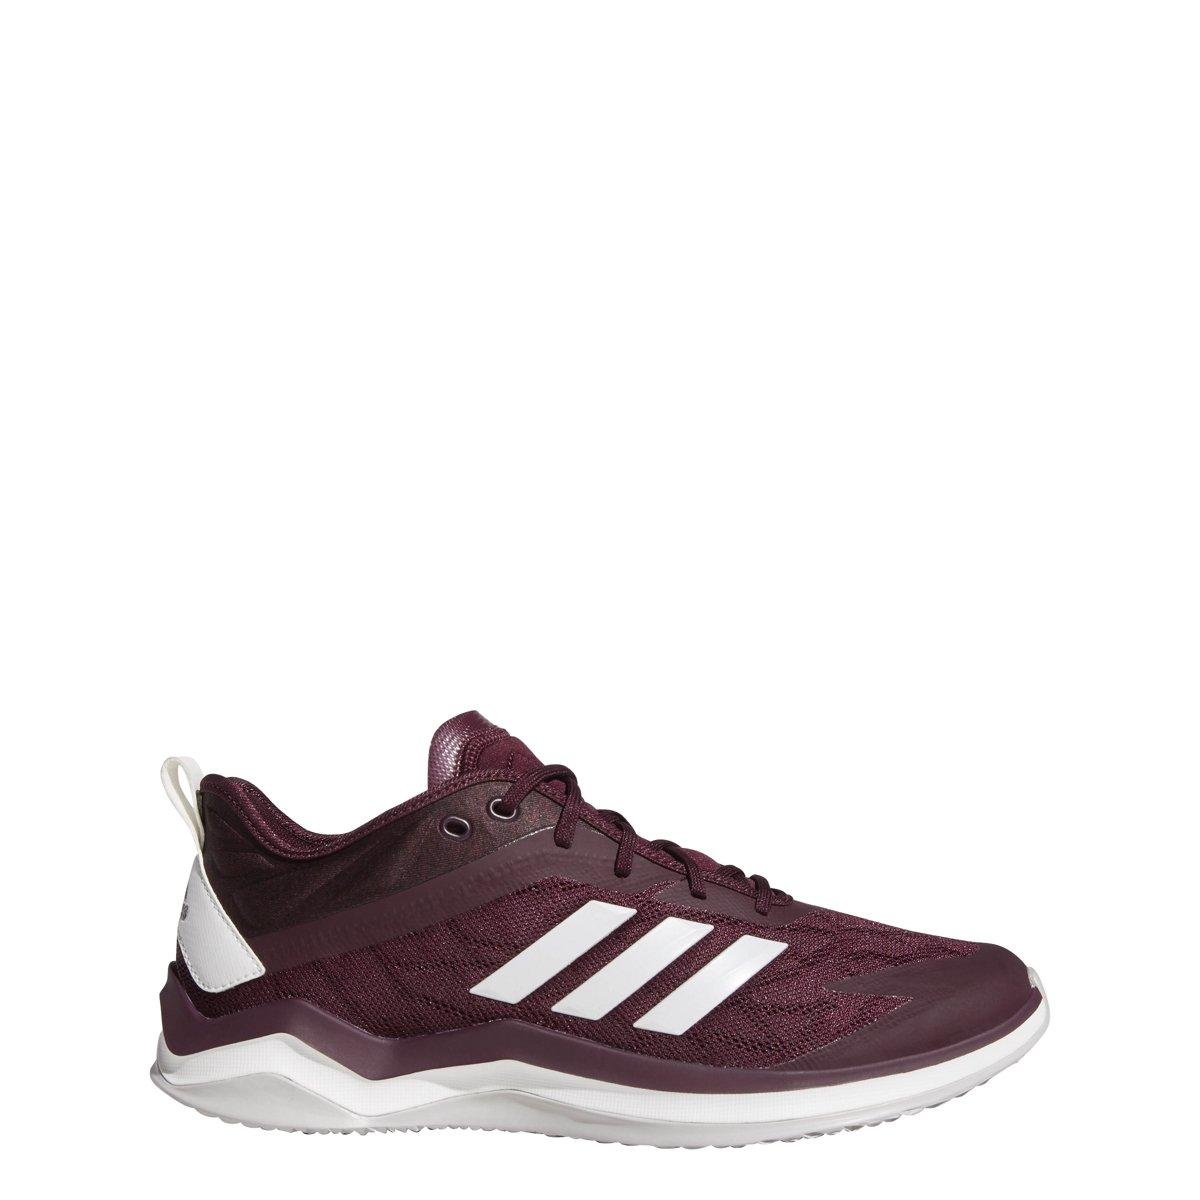 Adidas uomini b07bhkq5dw velocità trainer 4 13 s (m) usmaroon / cristallo